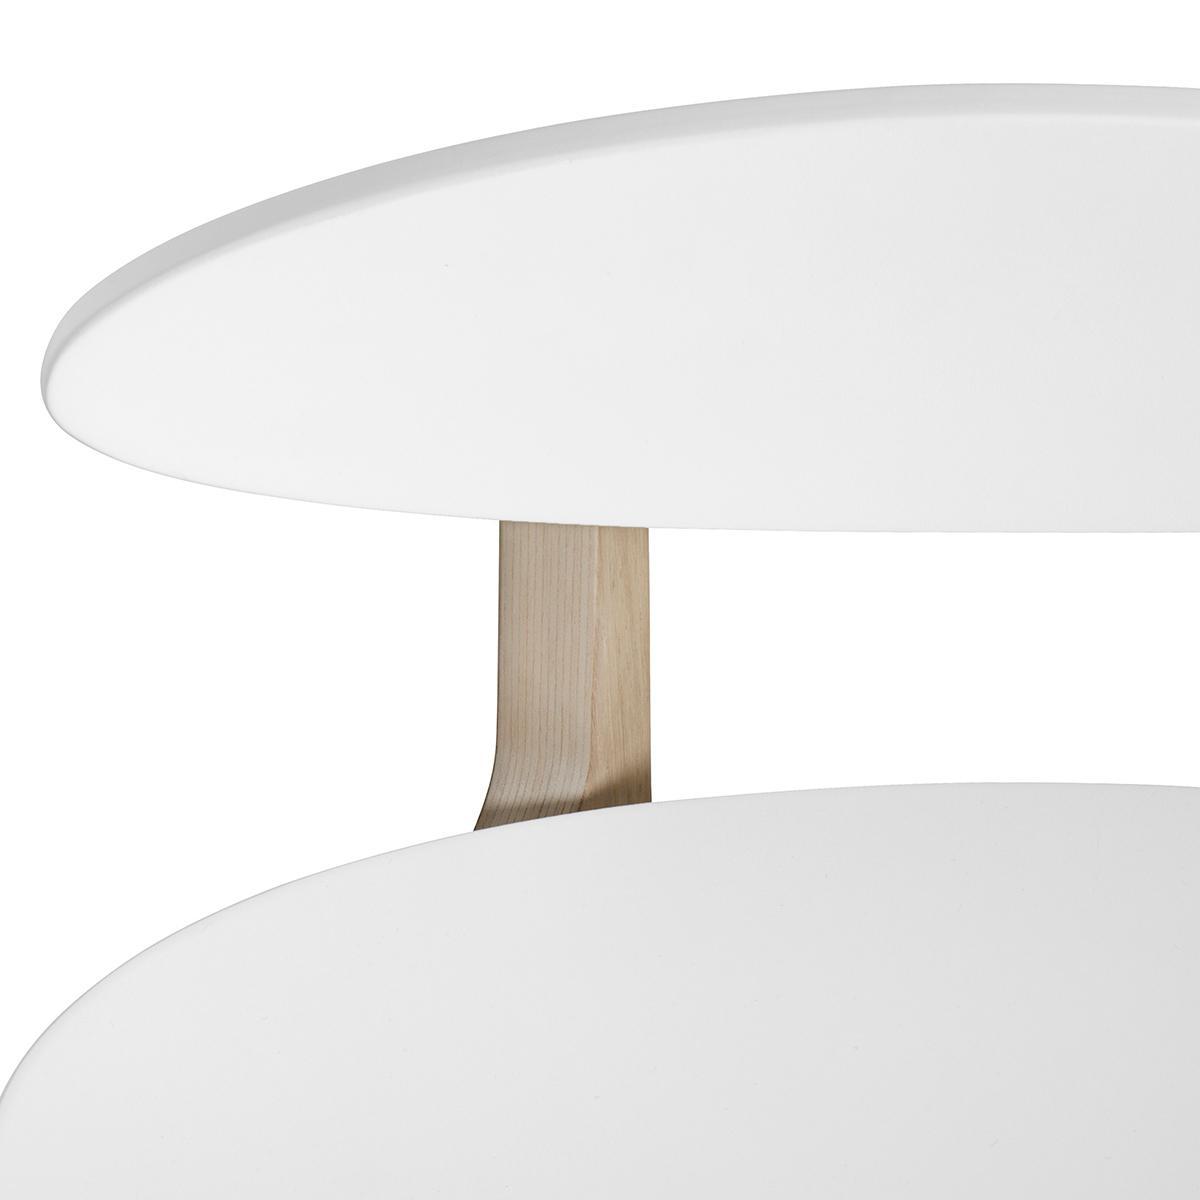 Silla infantil Pingpong WOOD Oliver Furniture blanco-roble